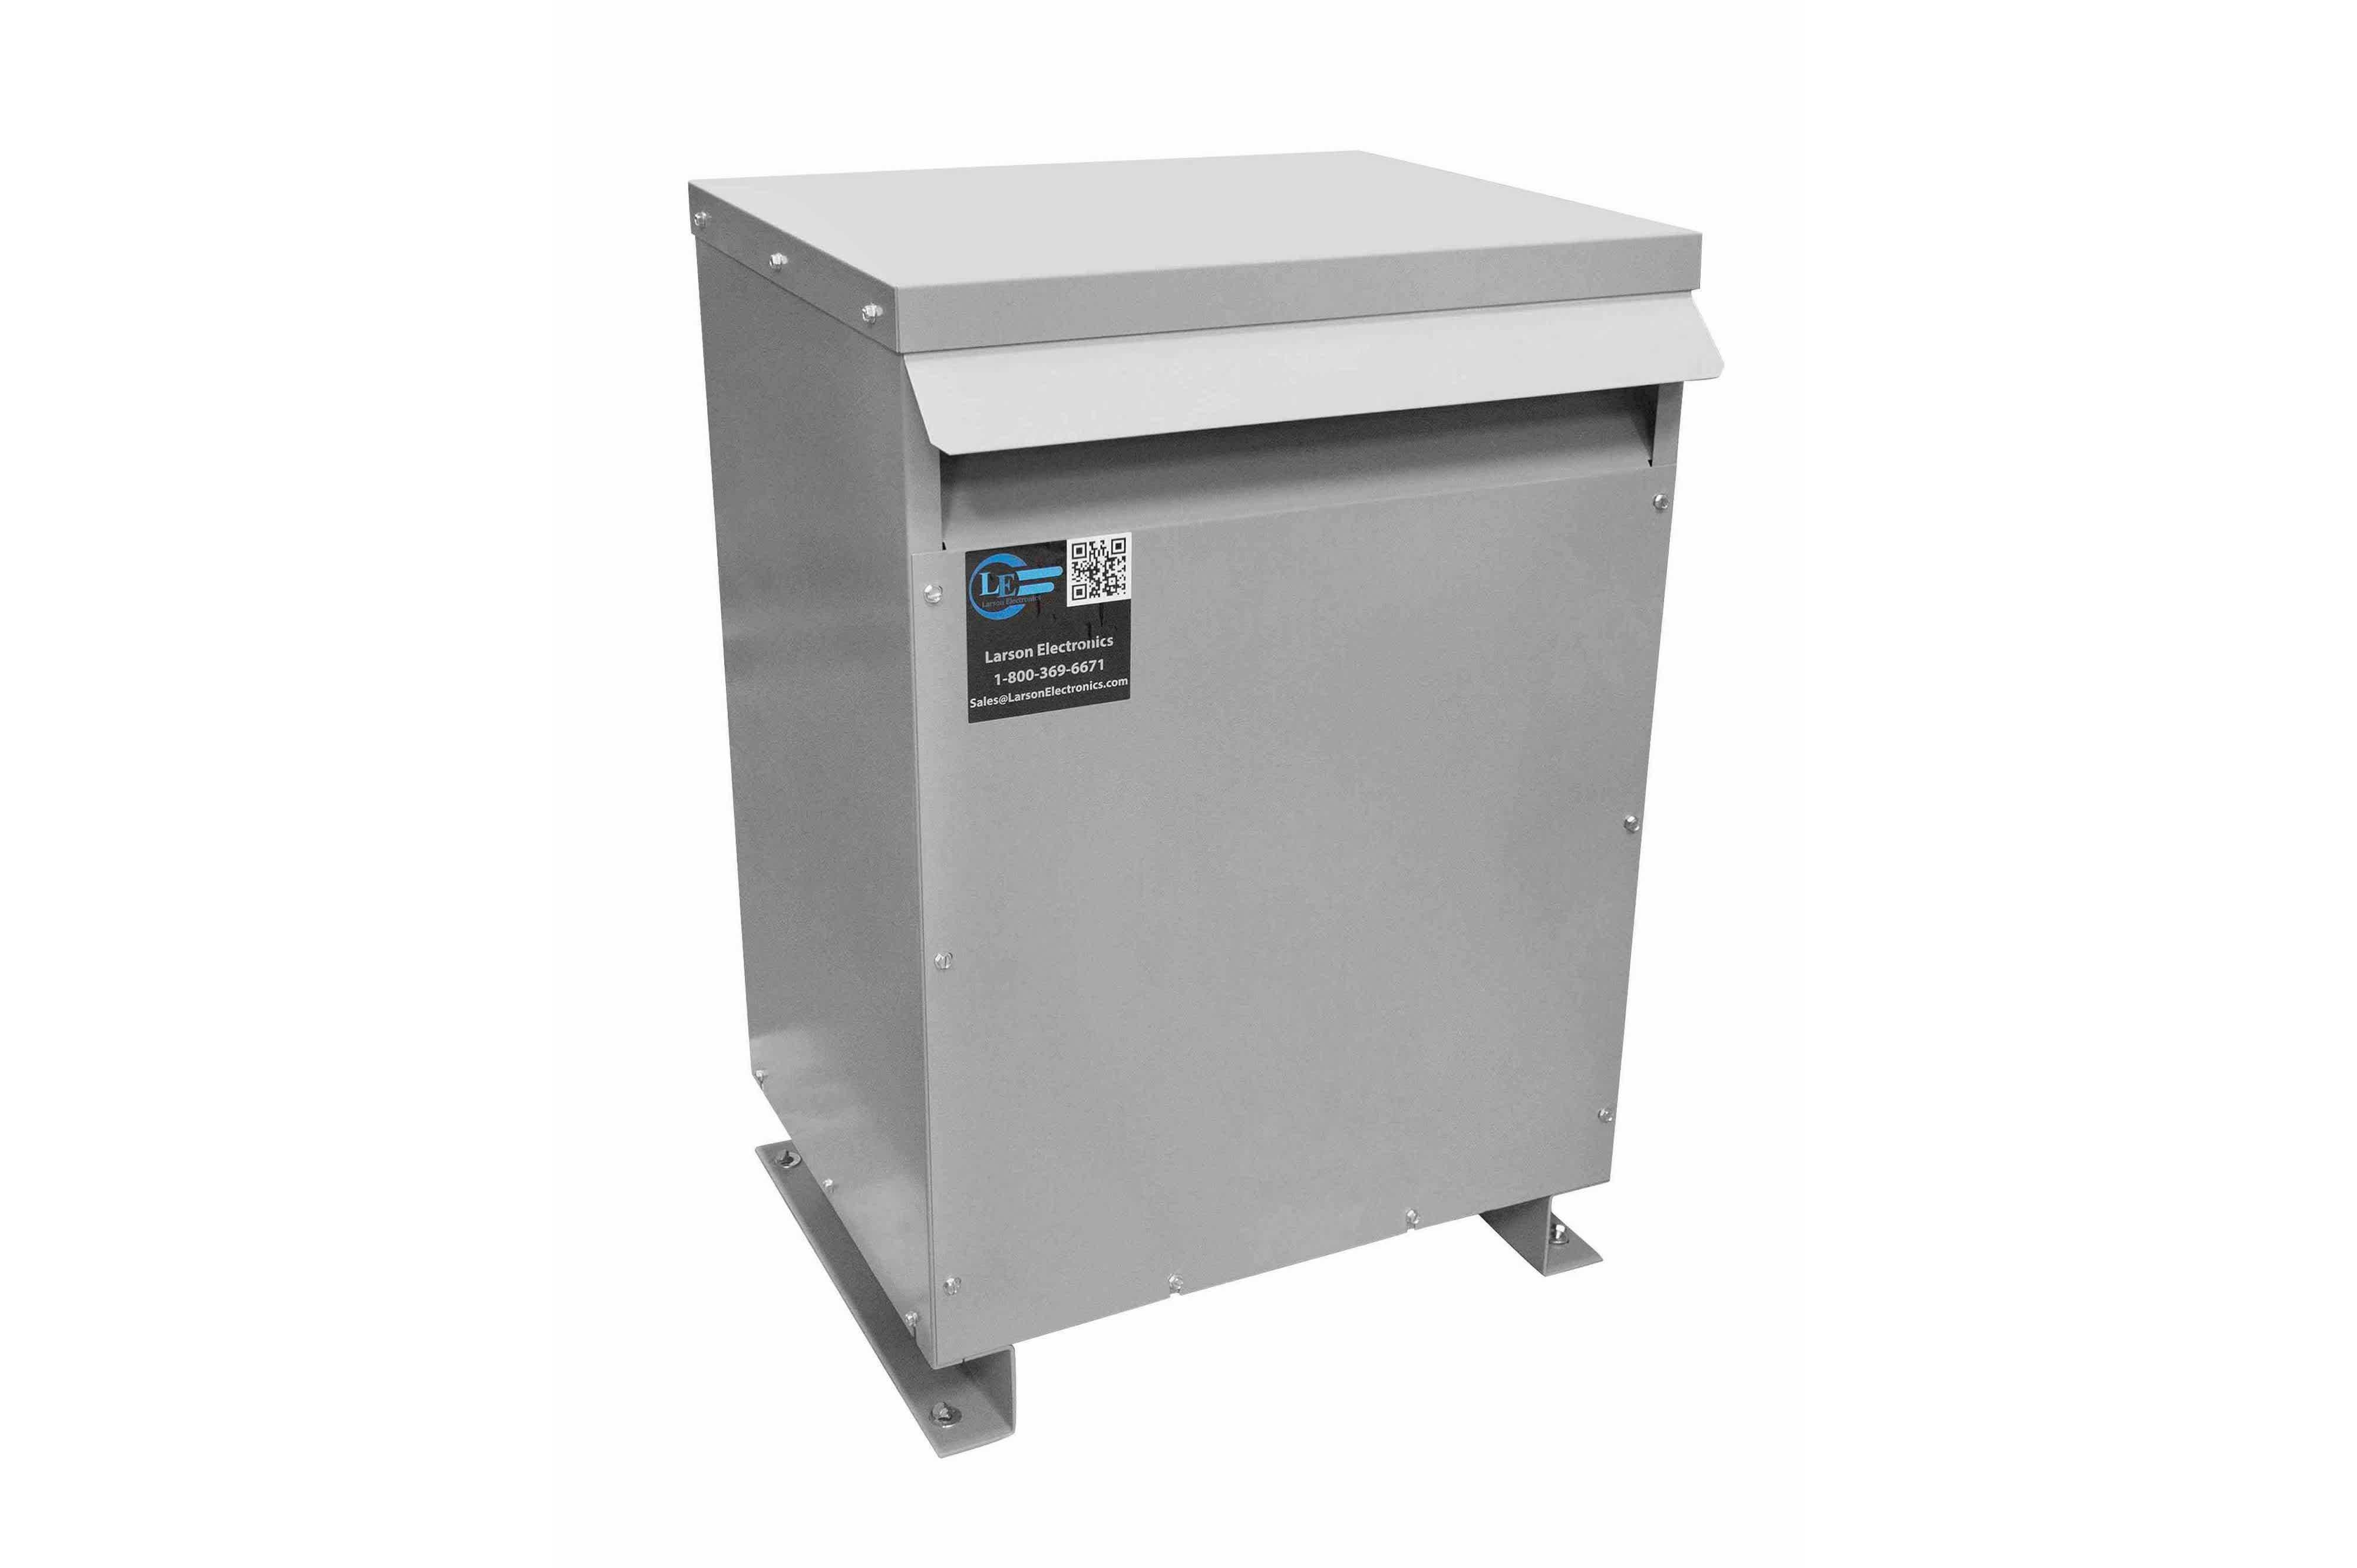 15 kVA 3PH Isolation Transformer, 415V Wye Primary, 600Y/347 Wye-N Secondary, N3R, Ventilated, 60 Hz